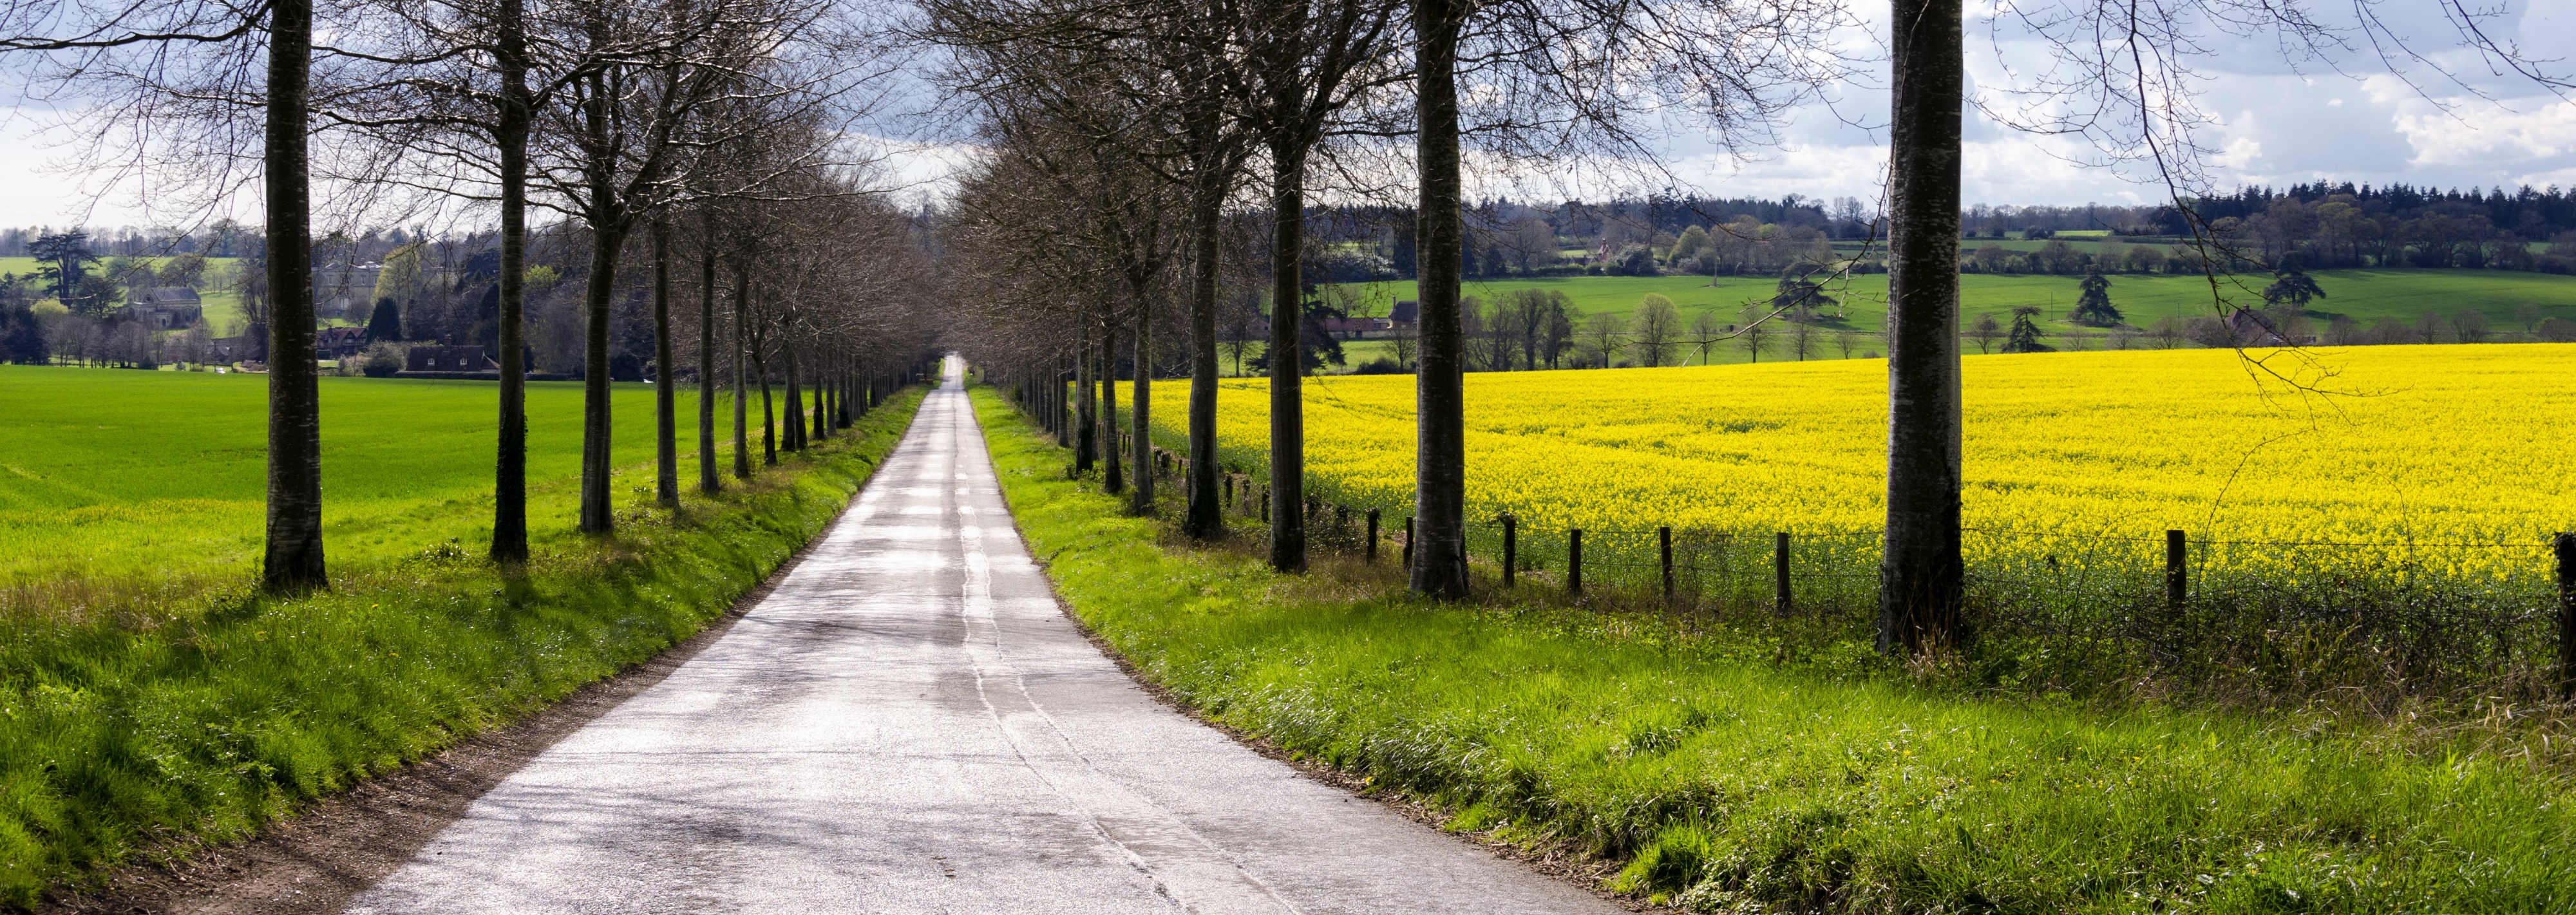 Car Hire United Kingdom Compare Deals At Vroomvroomvroom